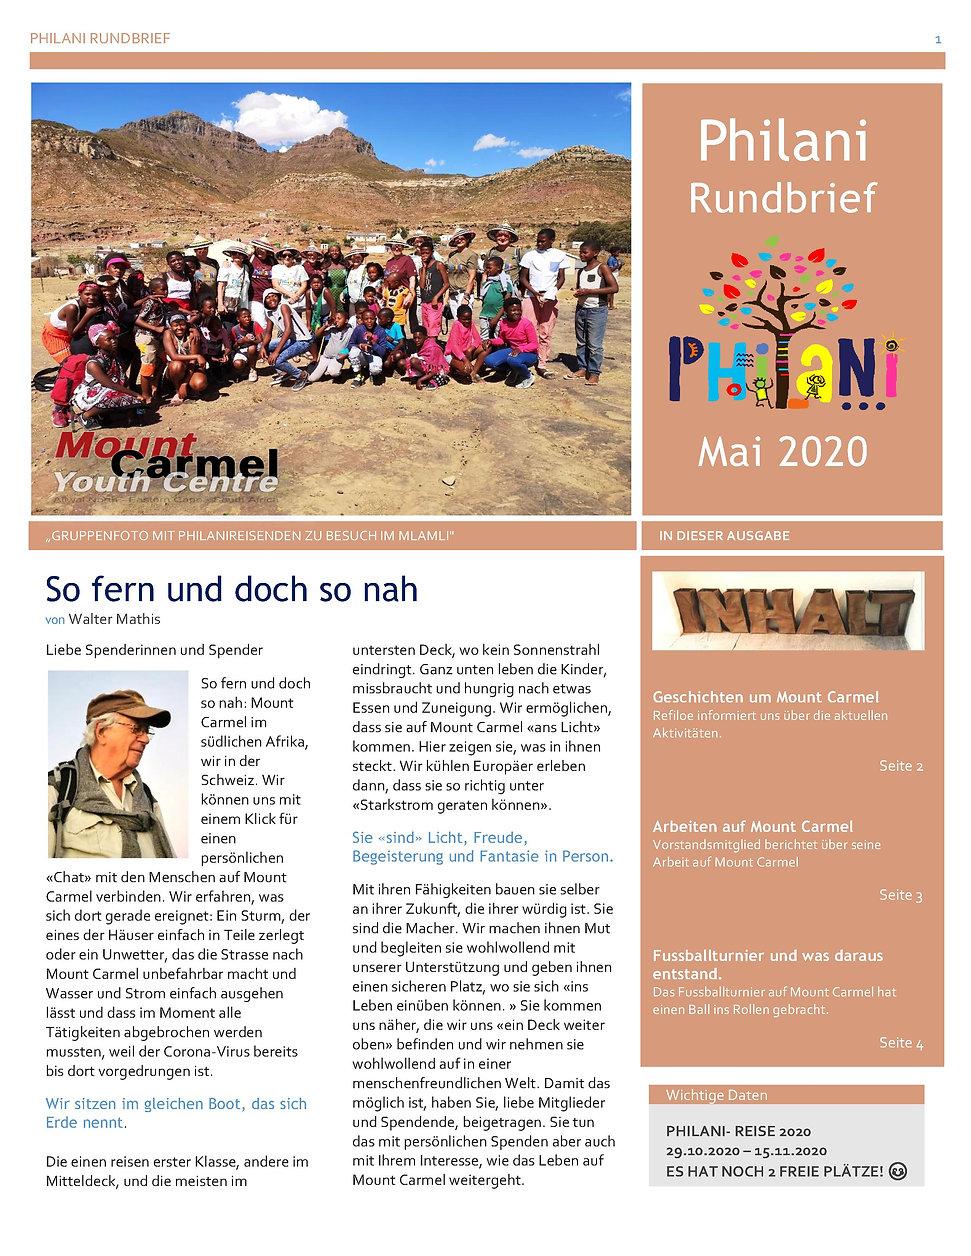 Philani Newsletter Mai 2020_1.jpg